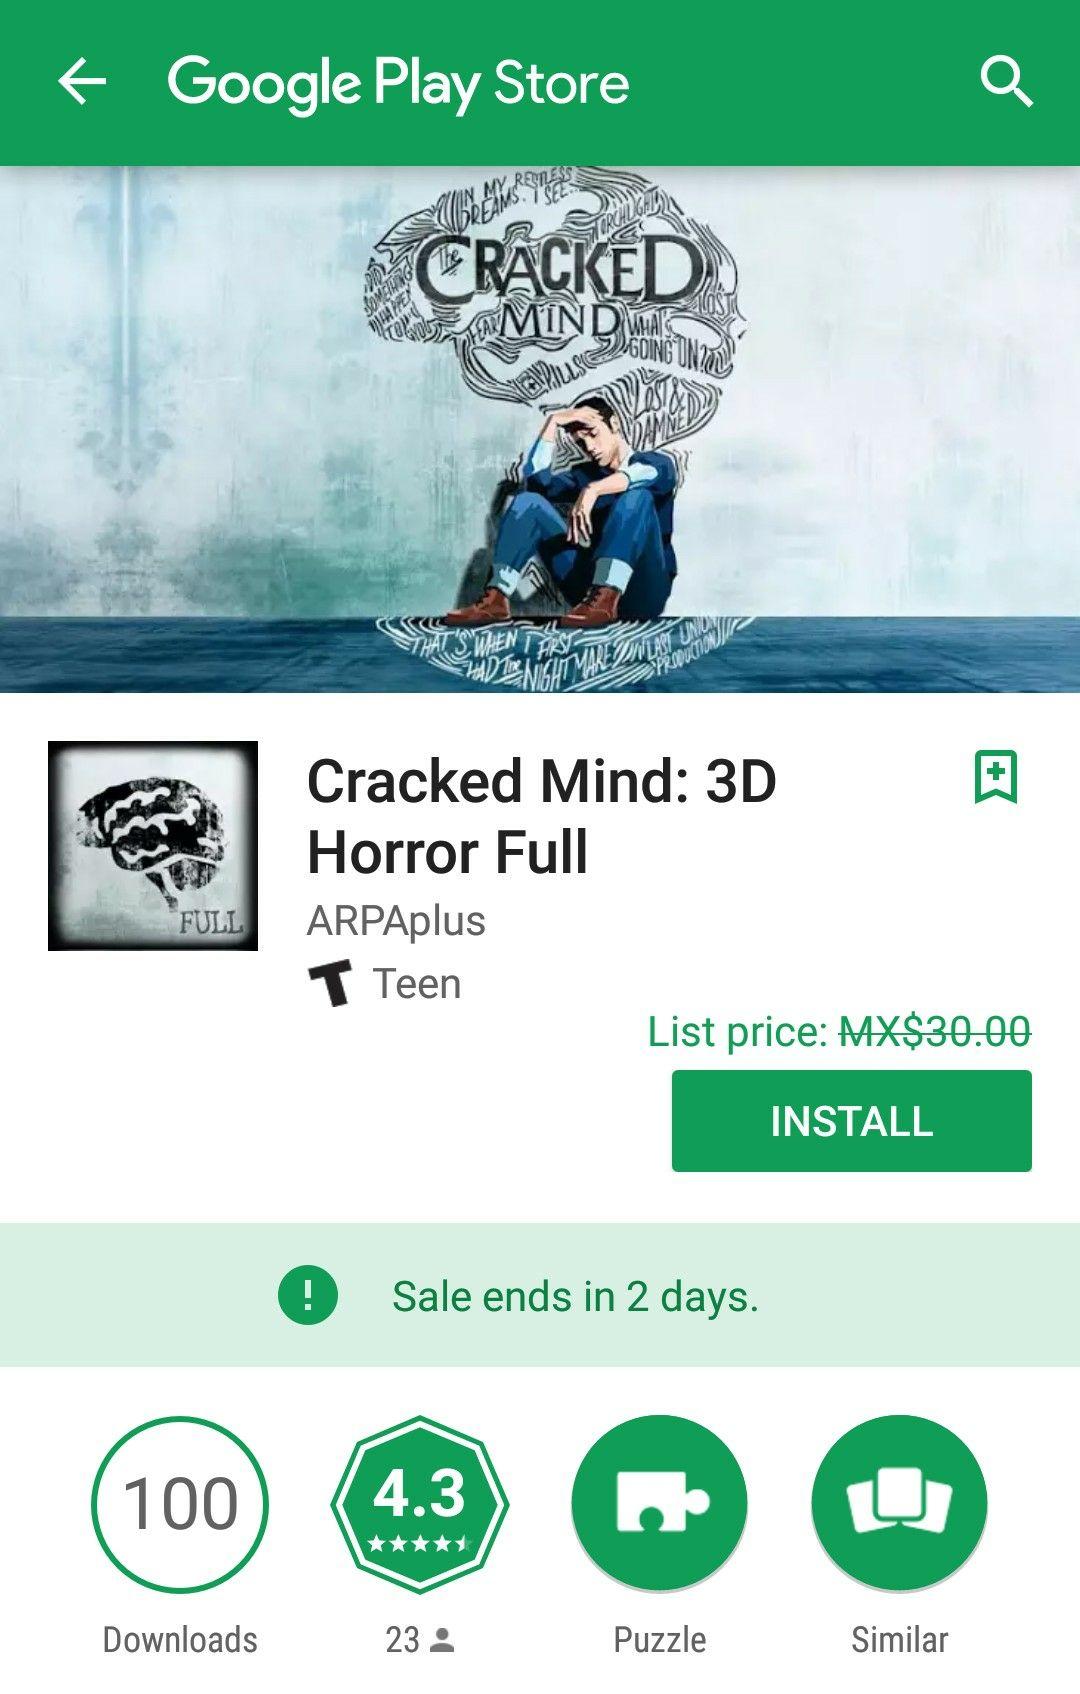 Google Play: Cracked Mind: 3D Horror Full GRATIS (Antes $30)